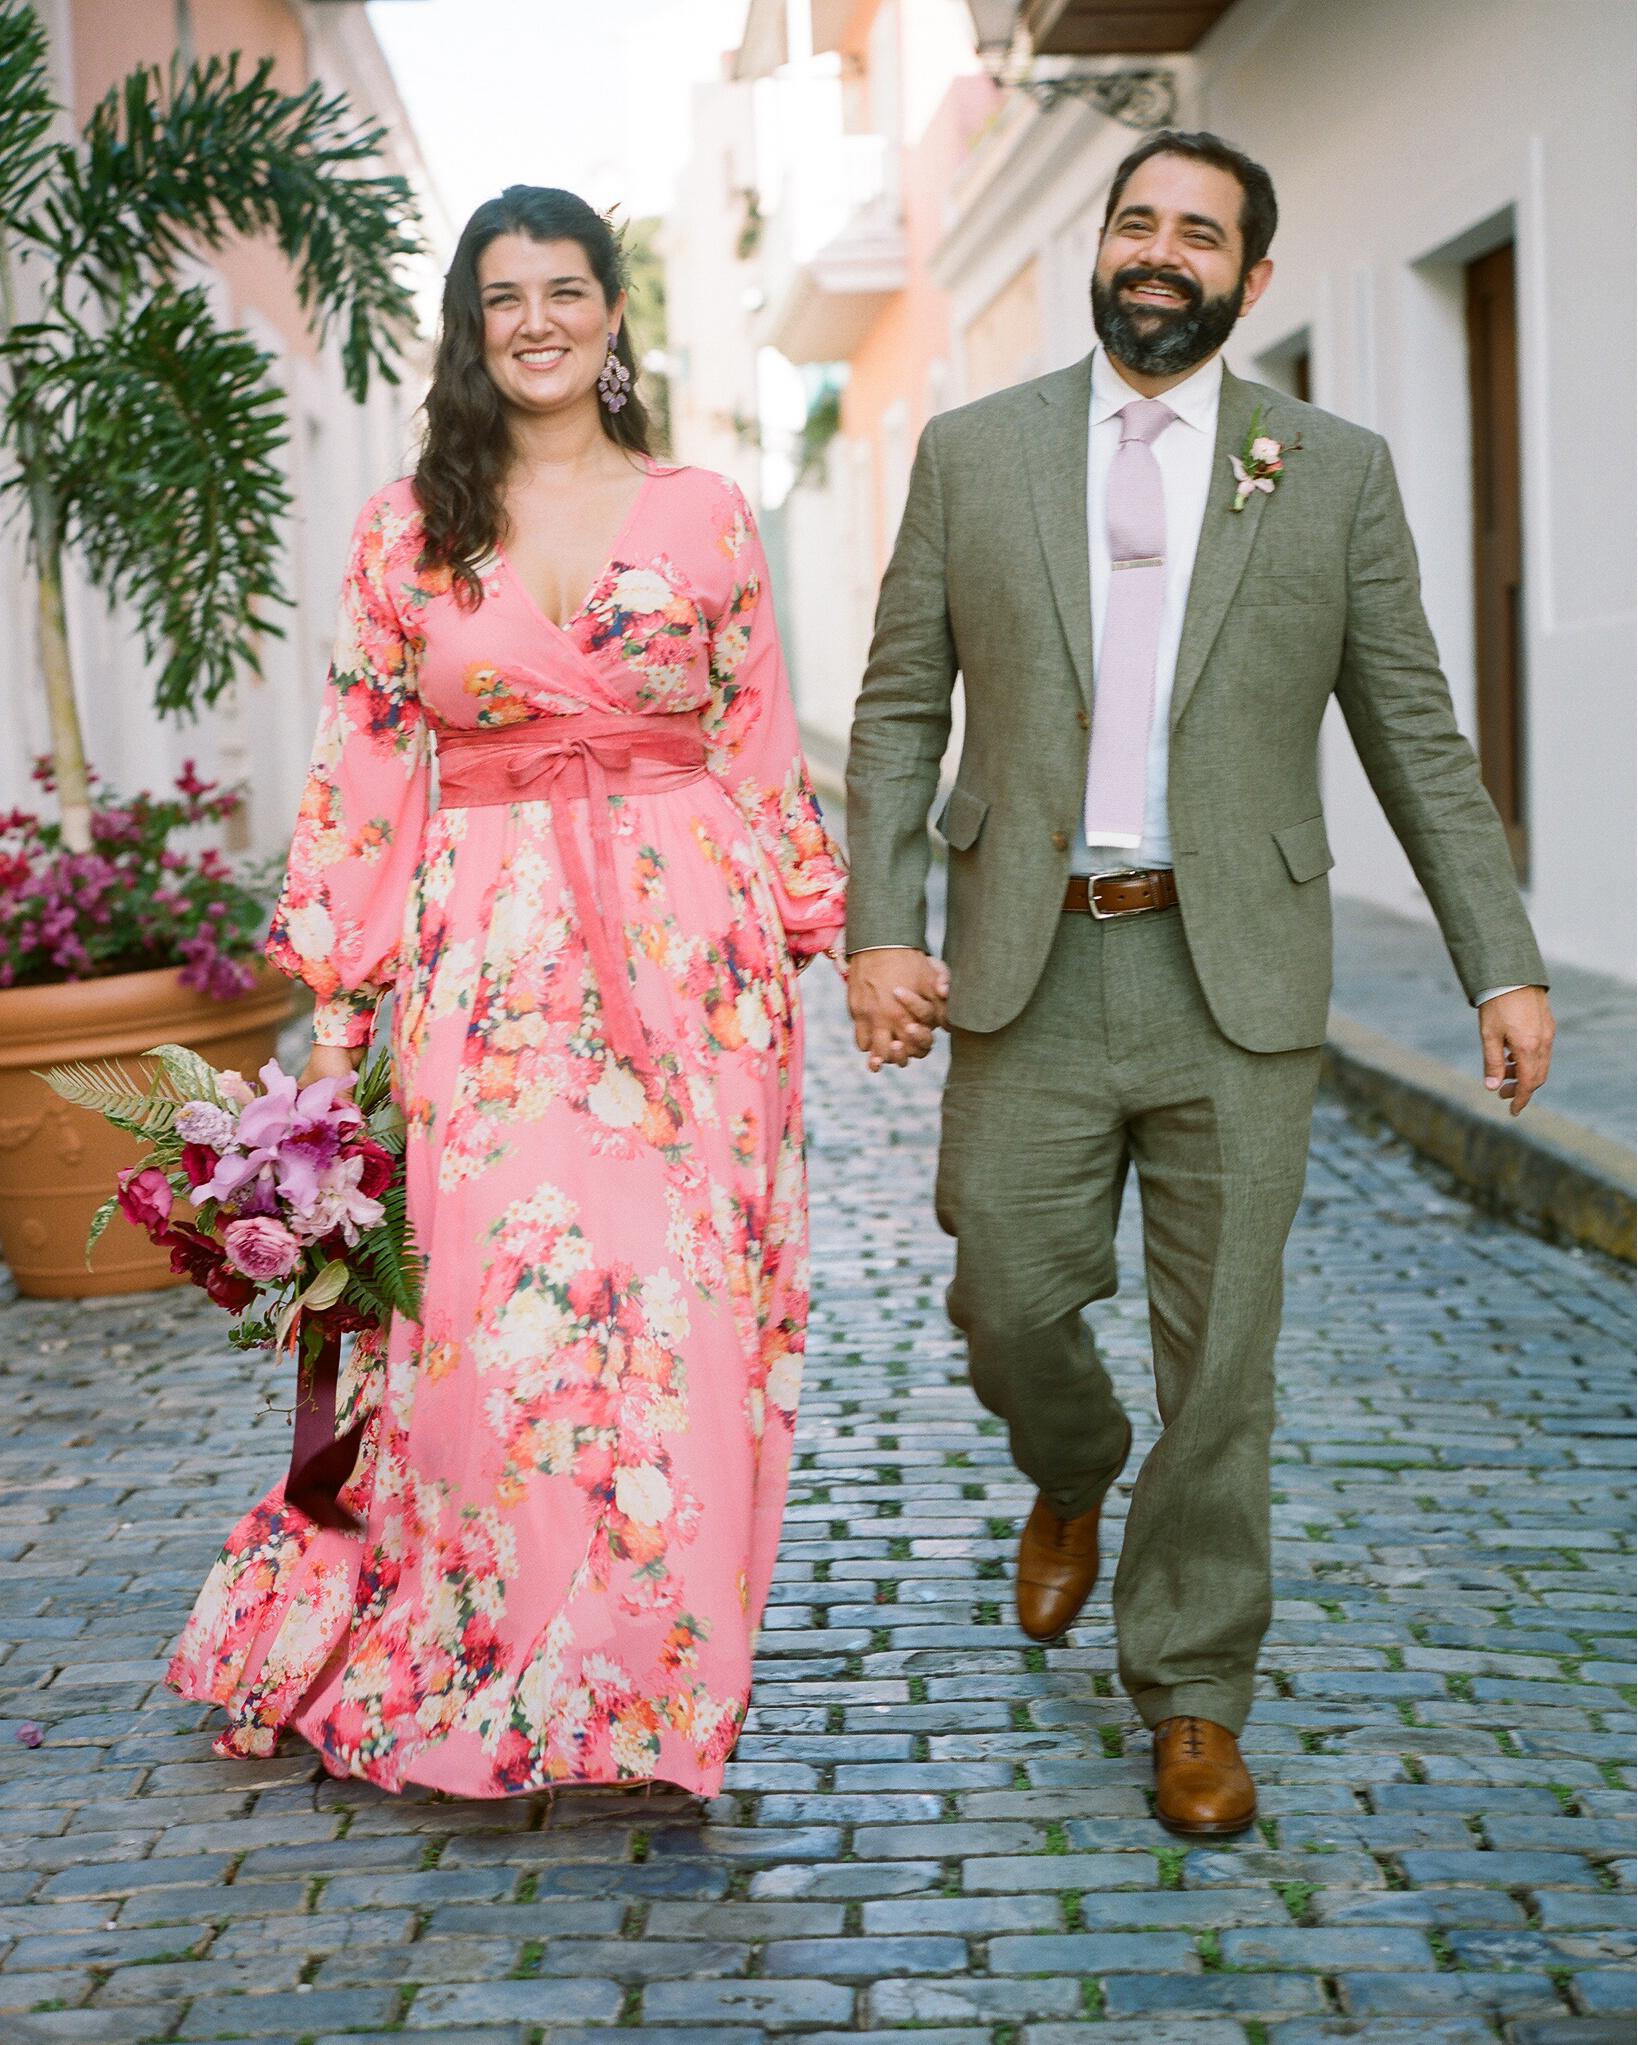 abby-jose-wedding-couple-206-s112118-0815.jpg